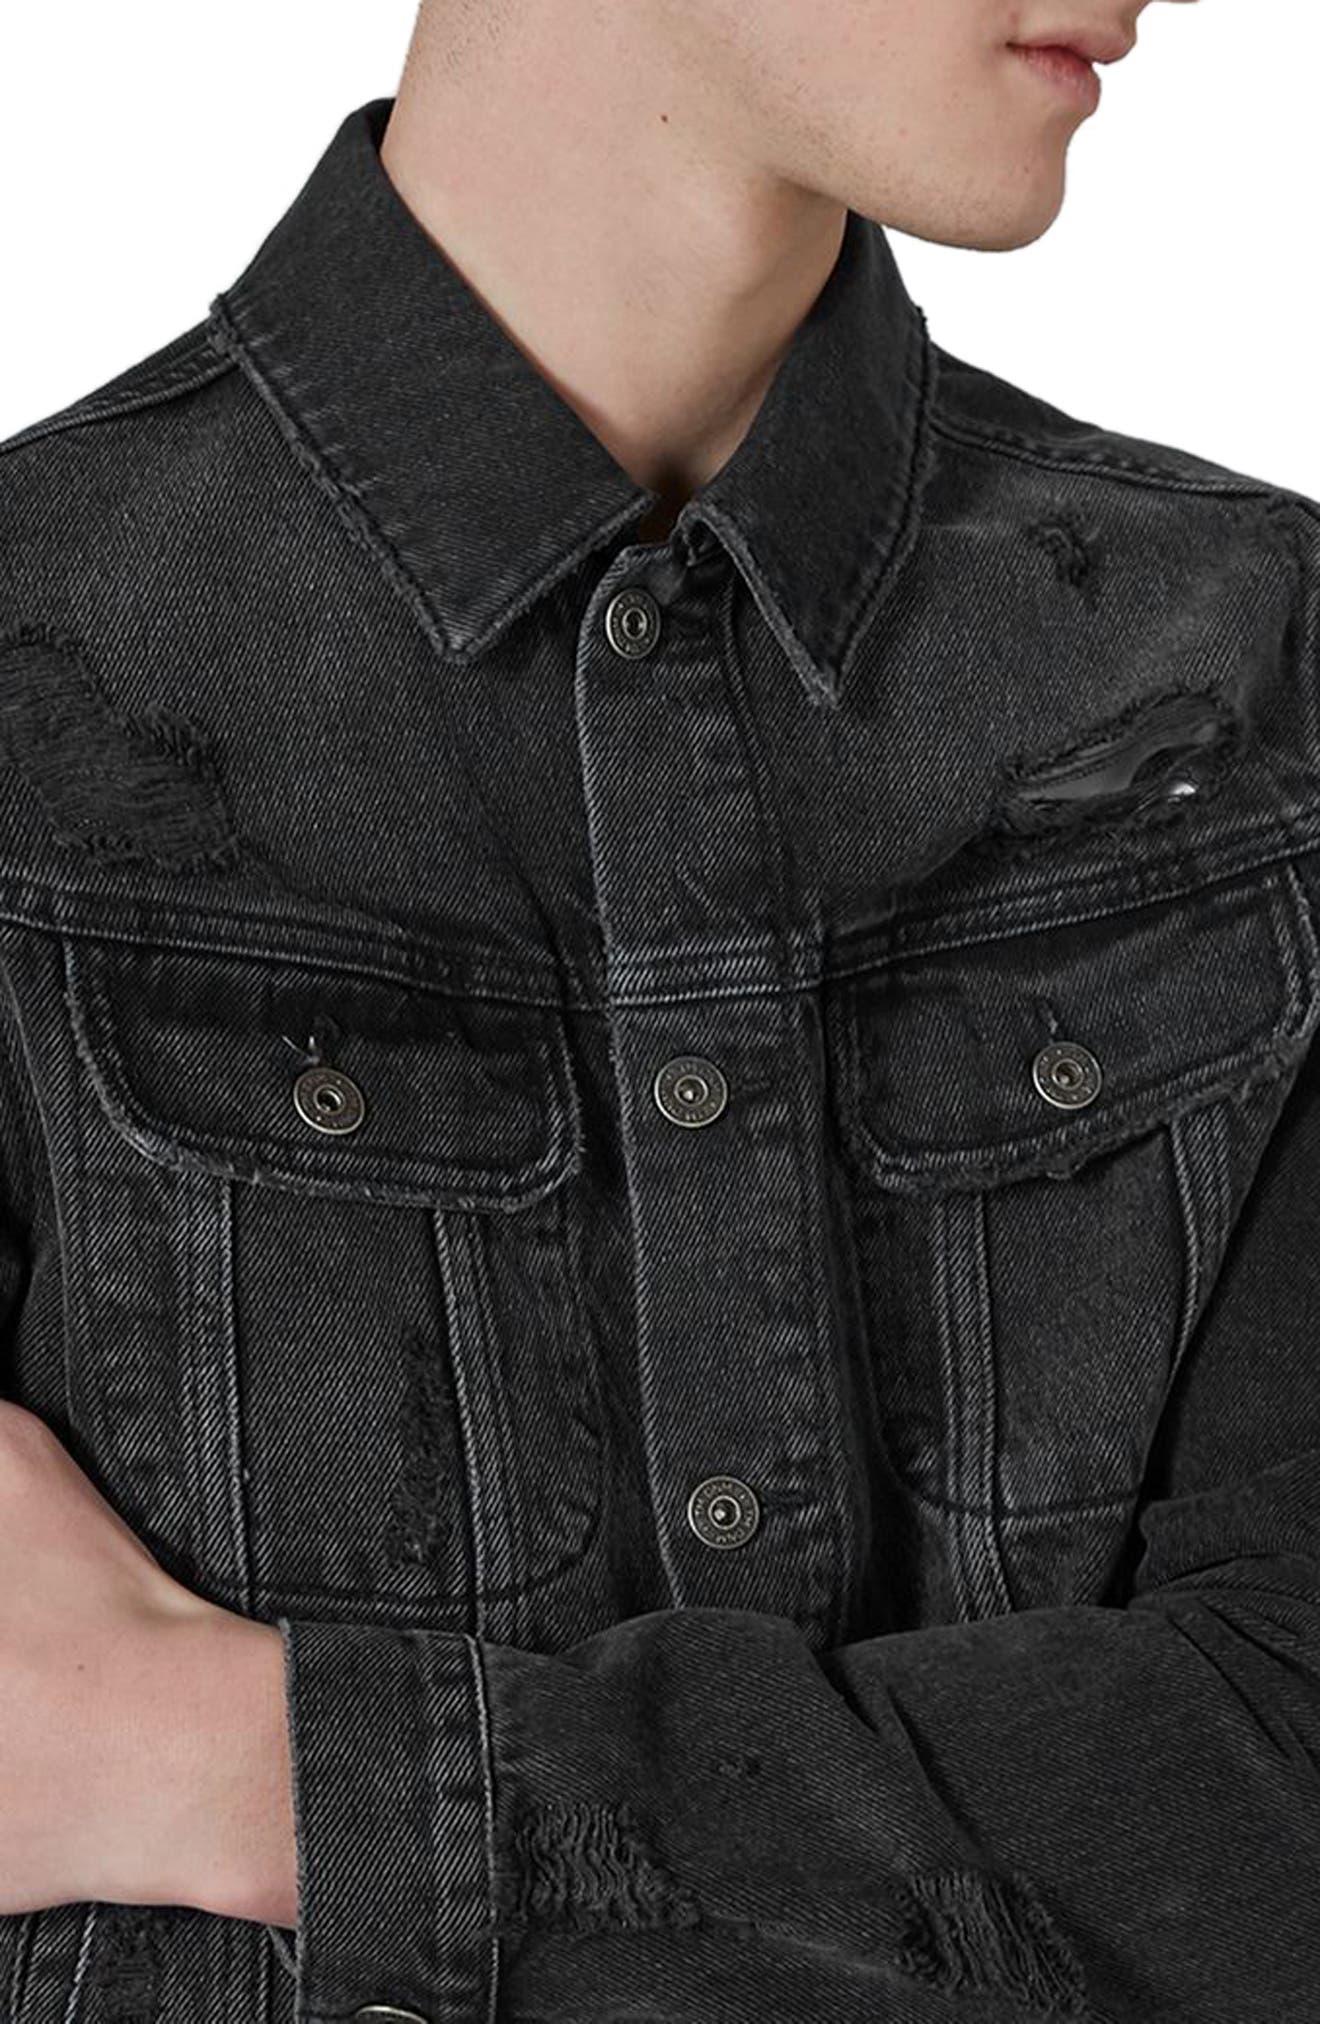 Piro Distressed Denim Jacket,                             Alternate thumbnail 3, color,